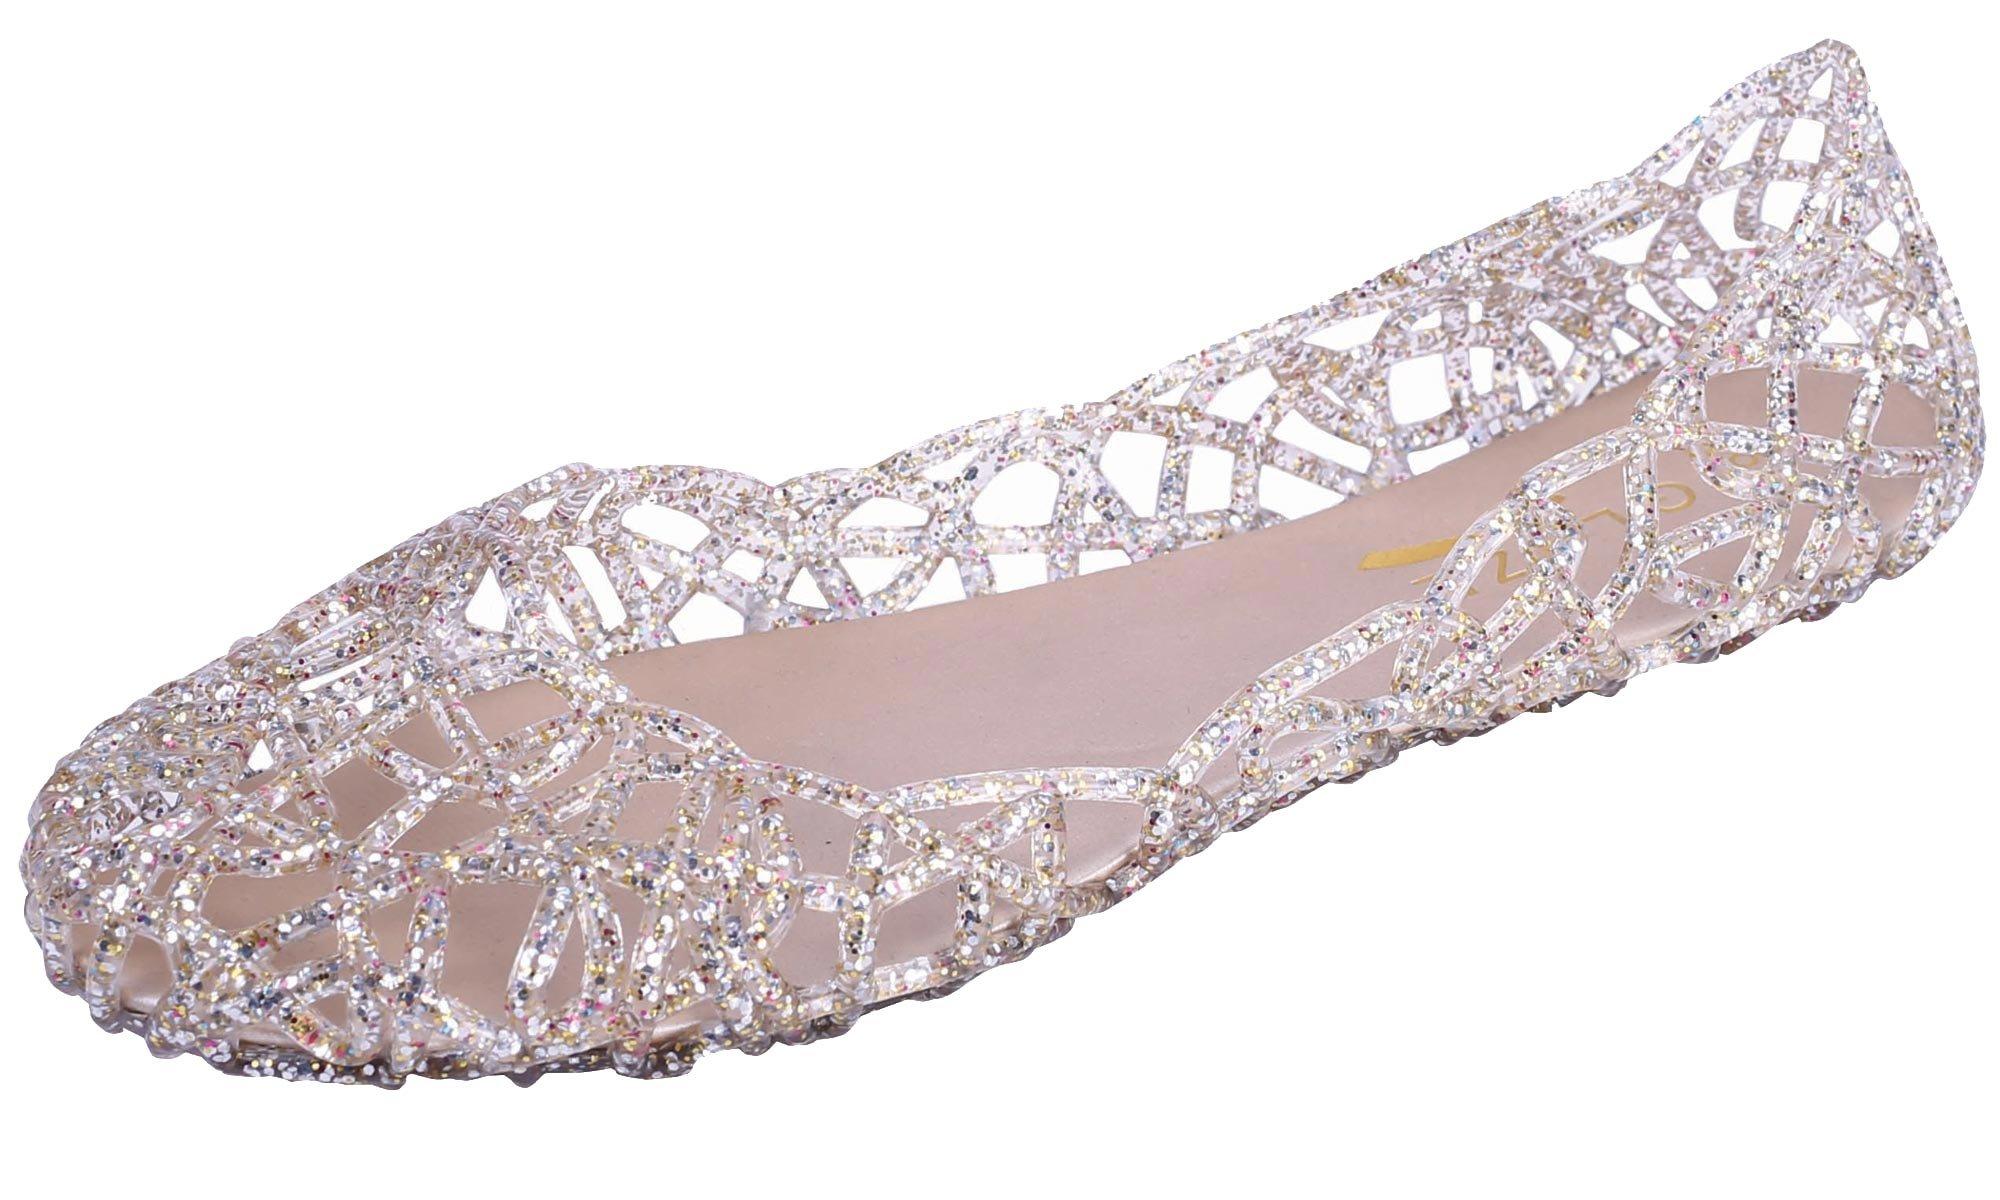 Glaze Women's Cutout Glitter Jelly Round Toe Ballet Flats (10 B(M) US, Clear/Multi)